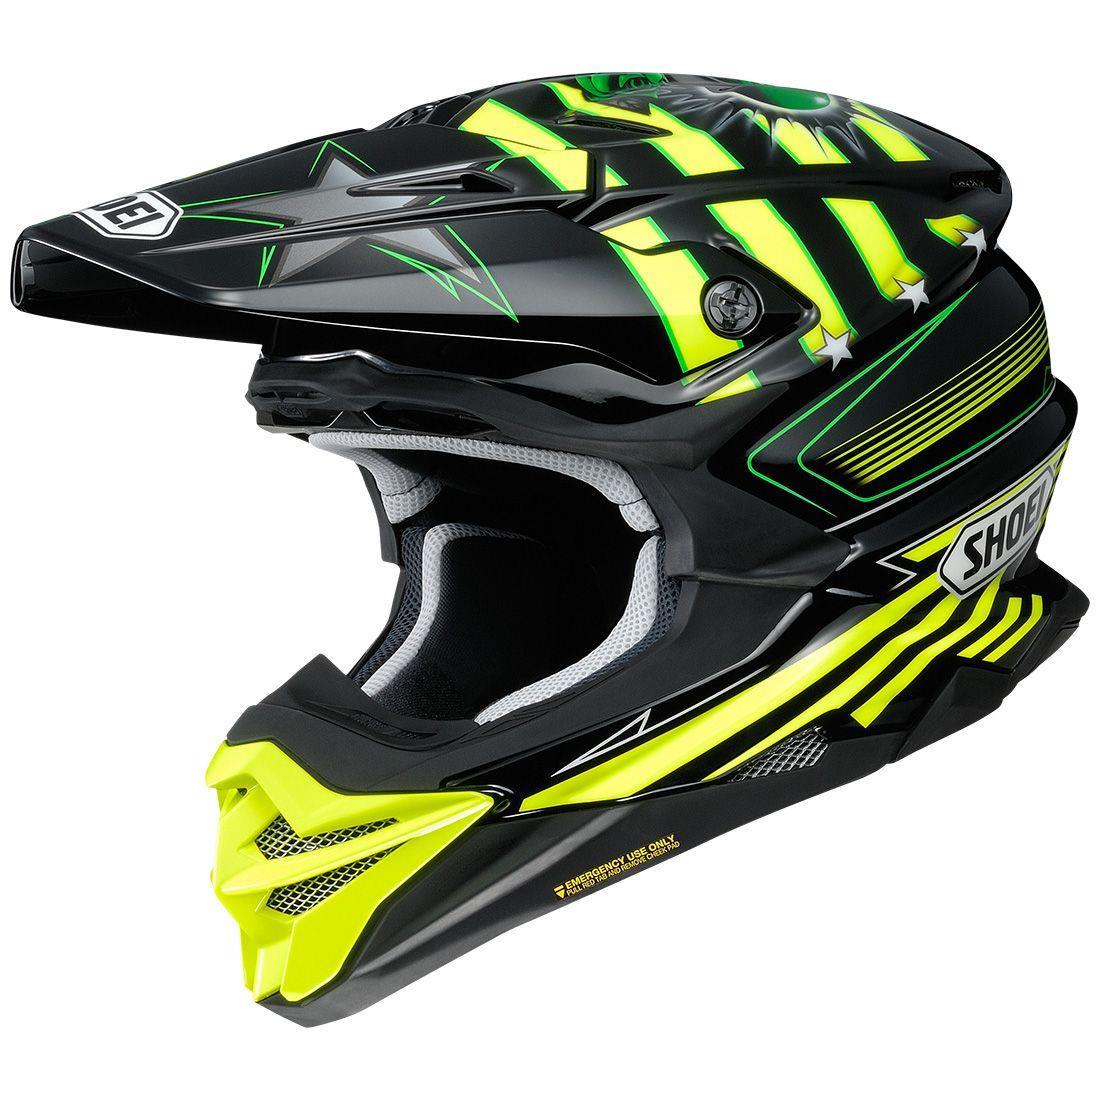 Shoei VFX-EVO Grant 3 Helmet Yellow (TC-3) (Yellow, X-Small)